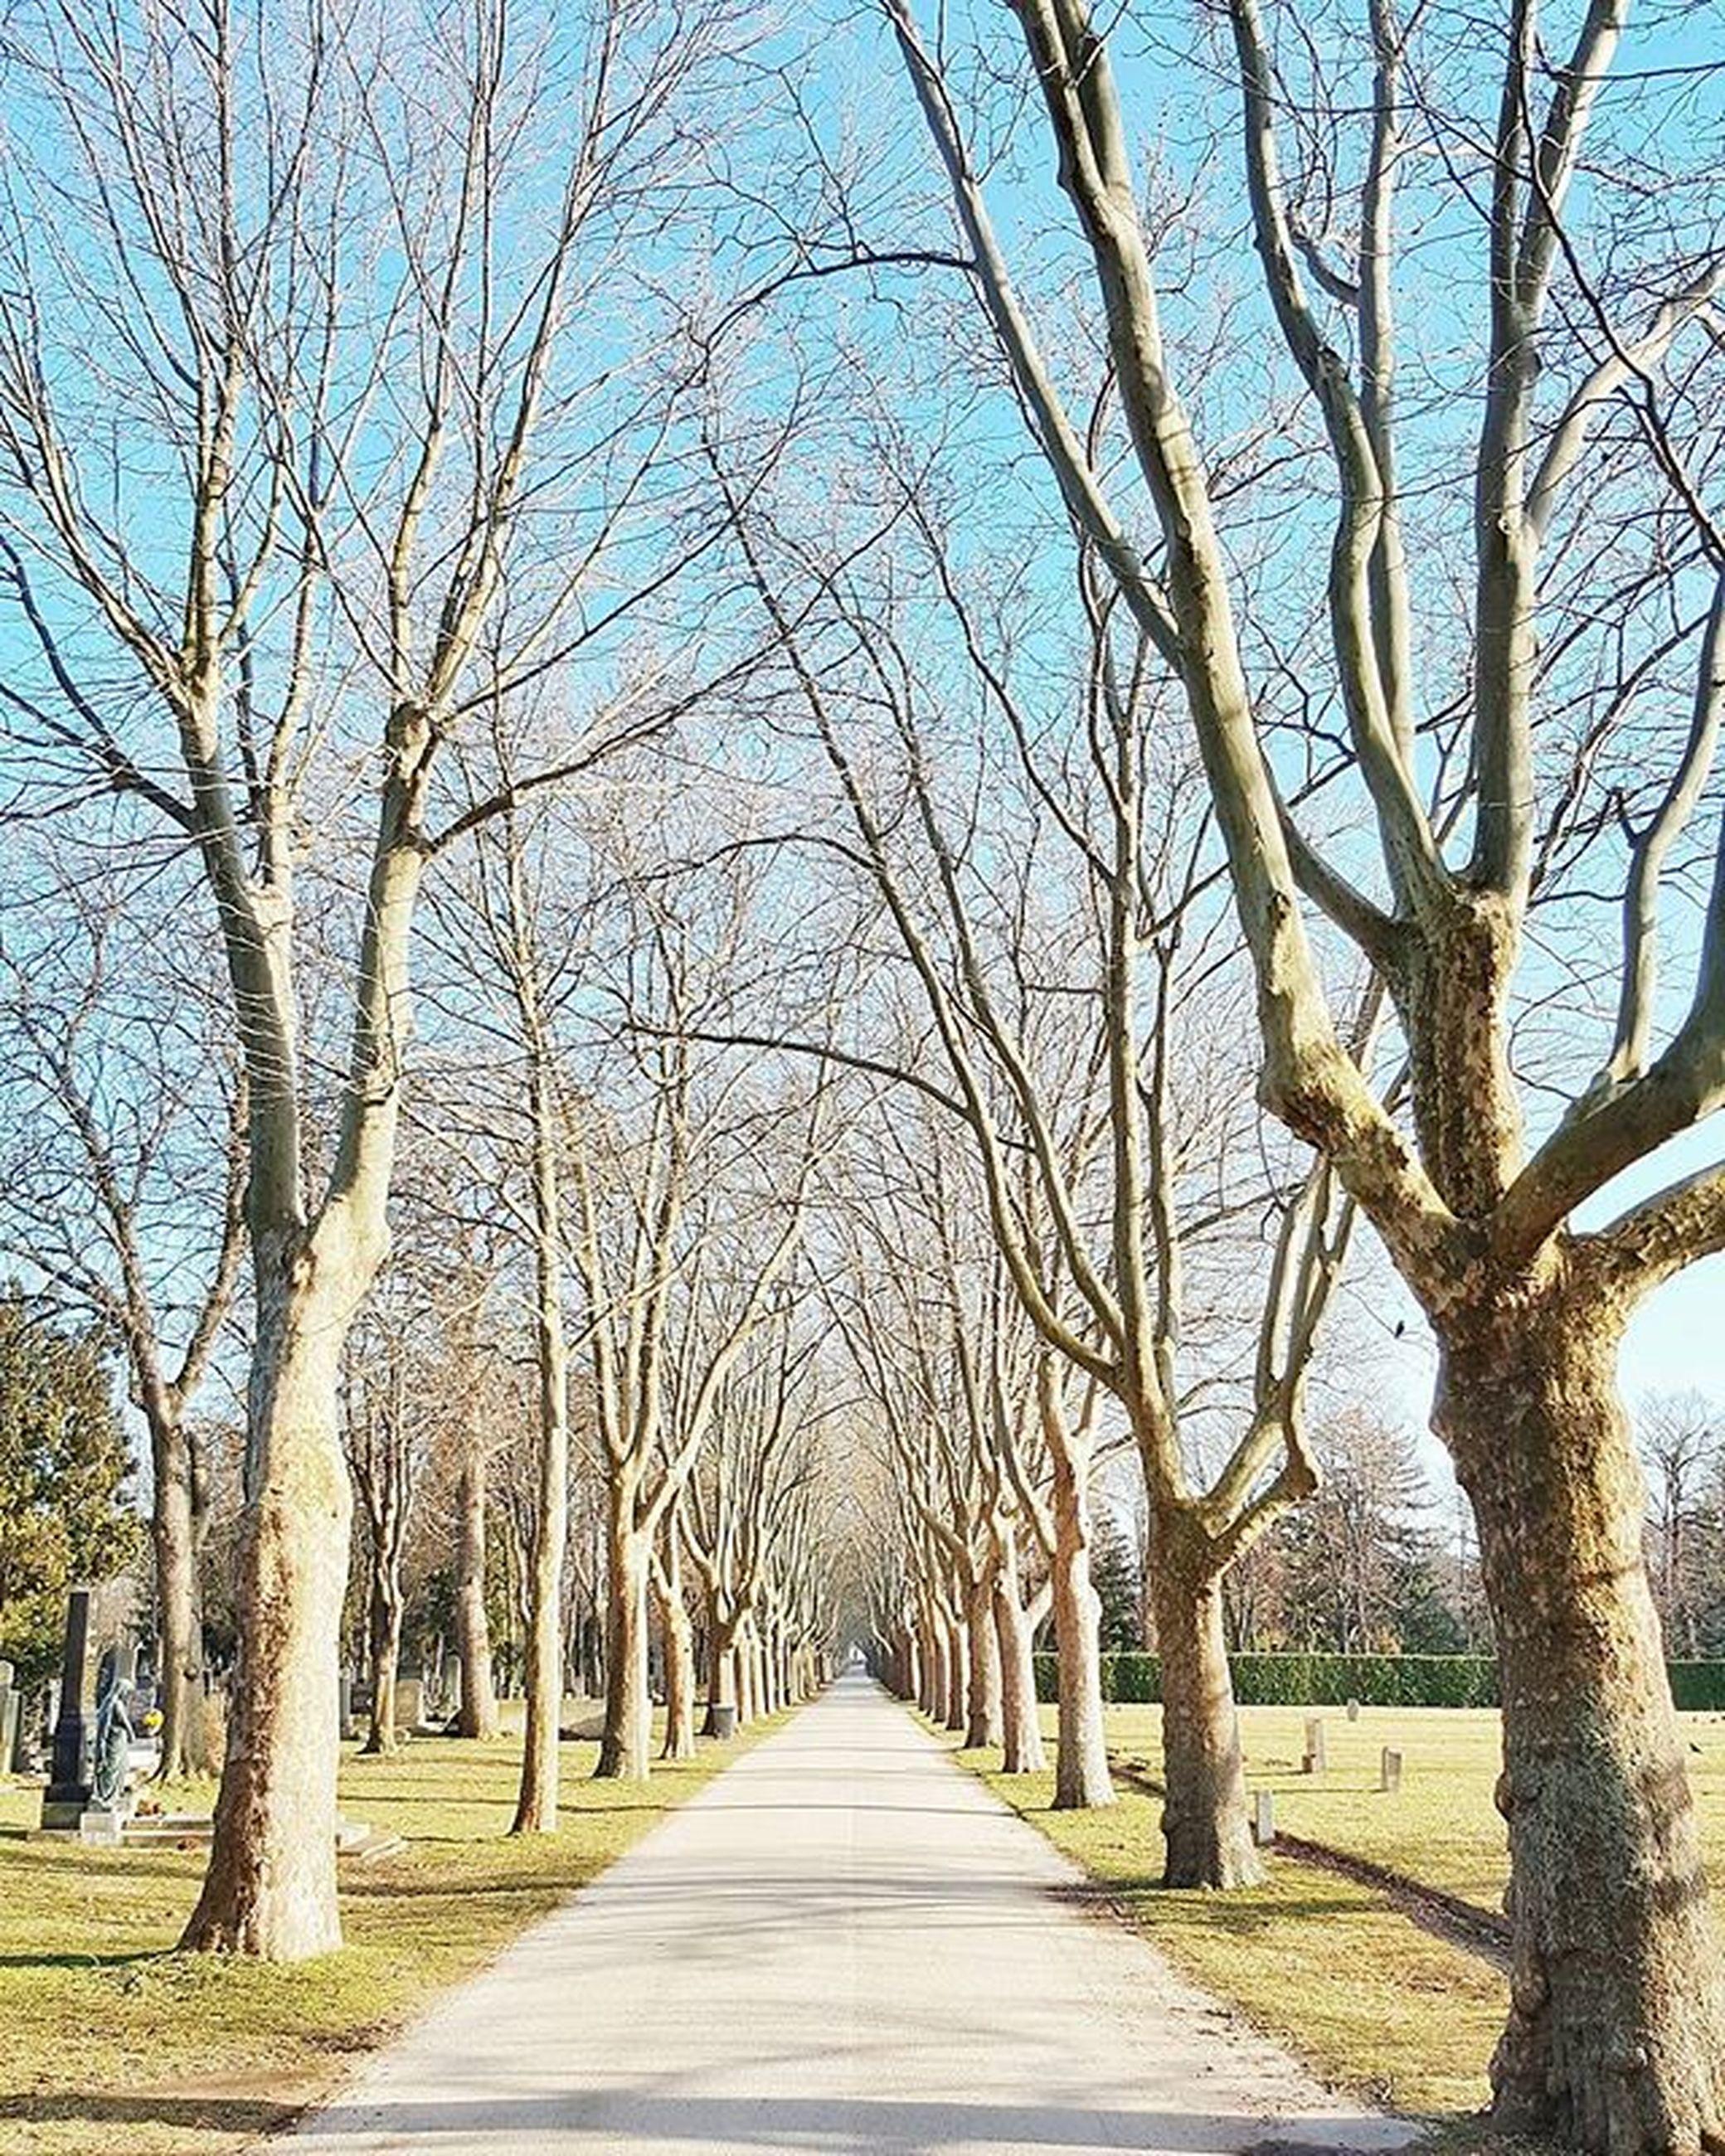 tree, the way forward, bare tree, diminishing perspective, treelined, branch, vanishing point, tranquility, tree trunk, tranquil scene, footpath, nature, long, walkway, empty, road, empty road, scenics, sky, narrow